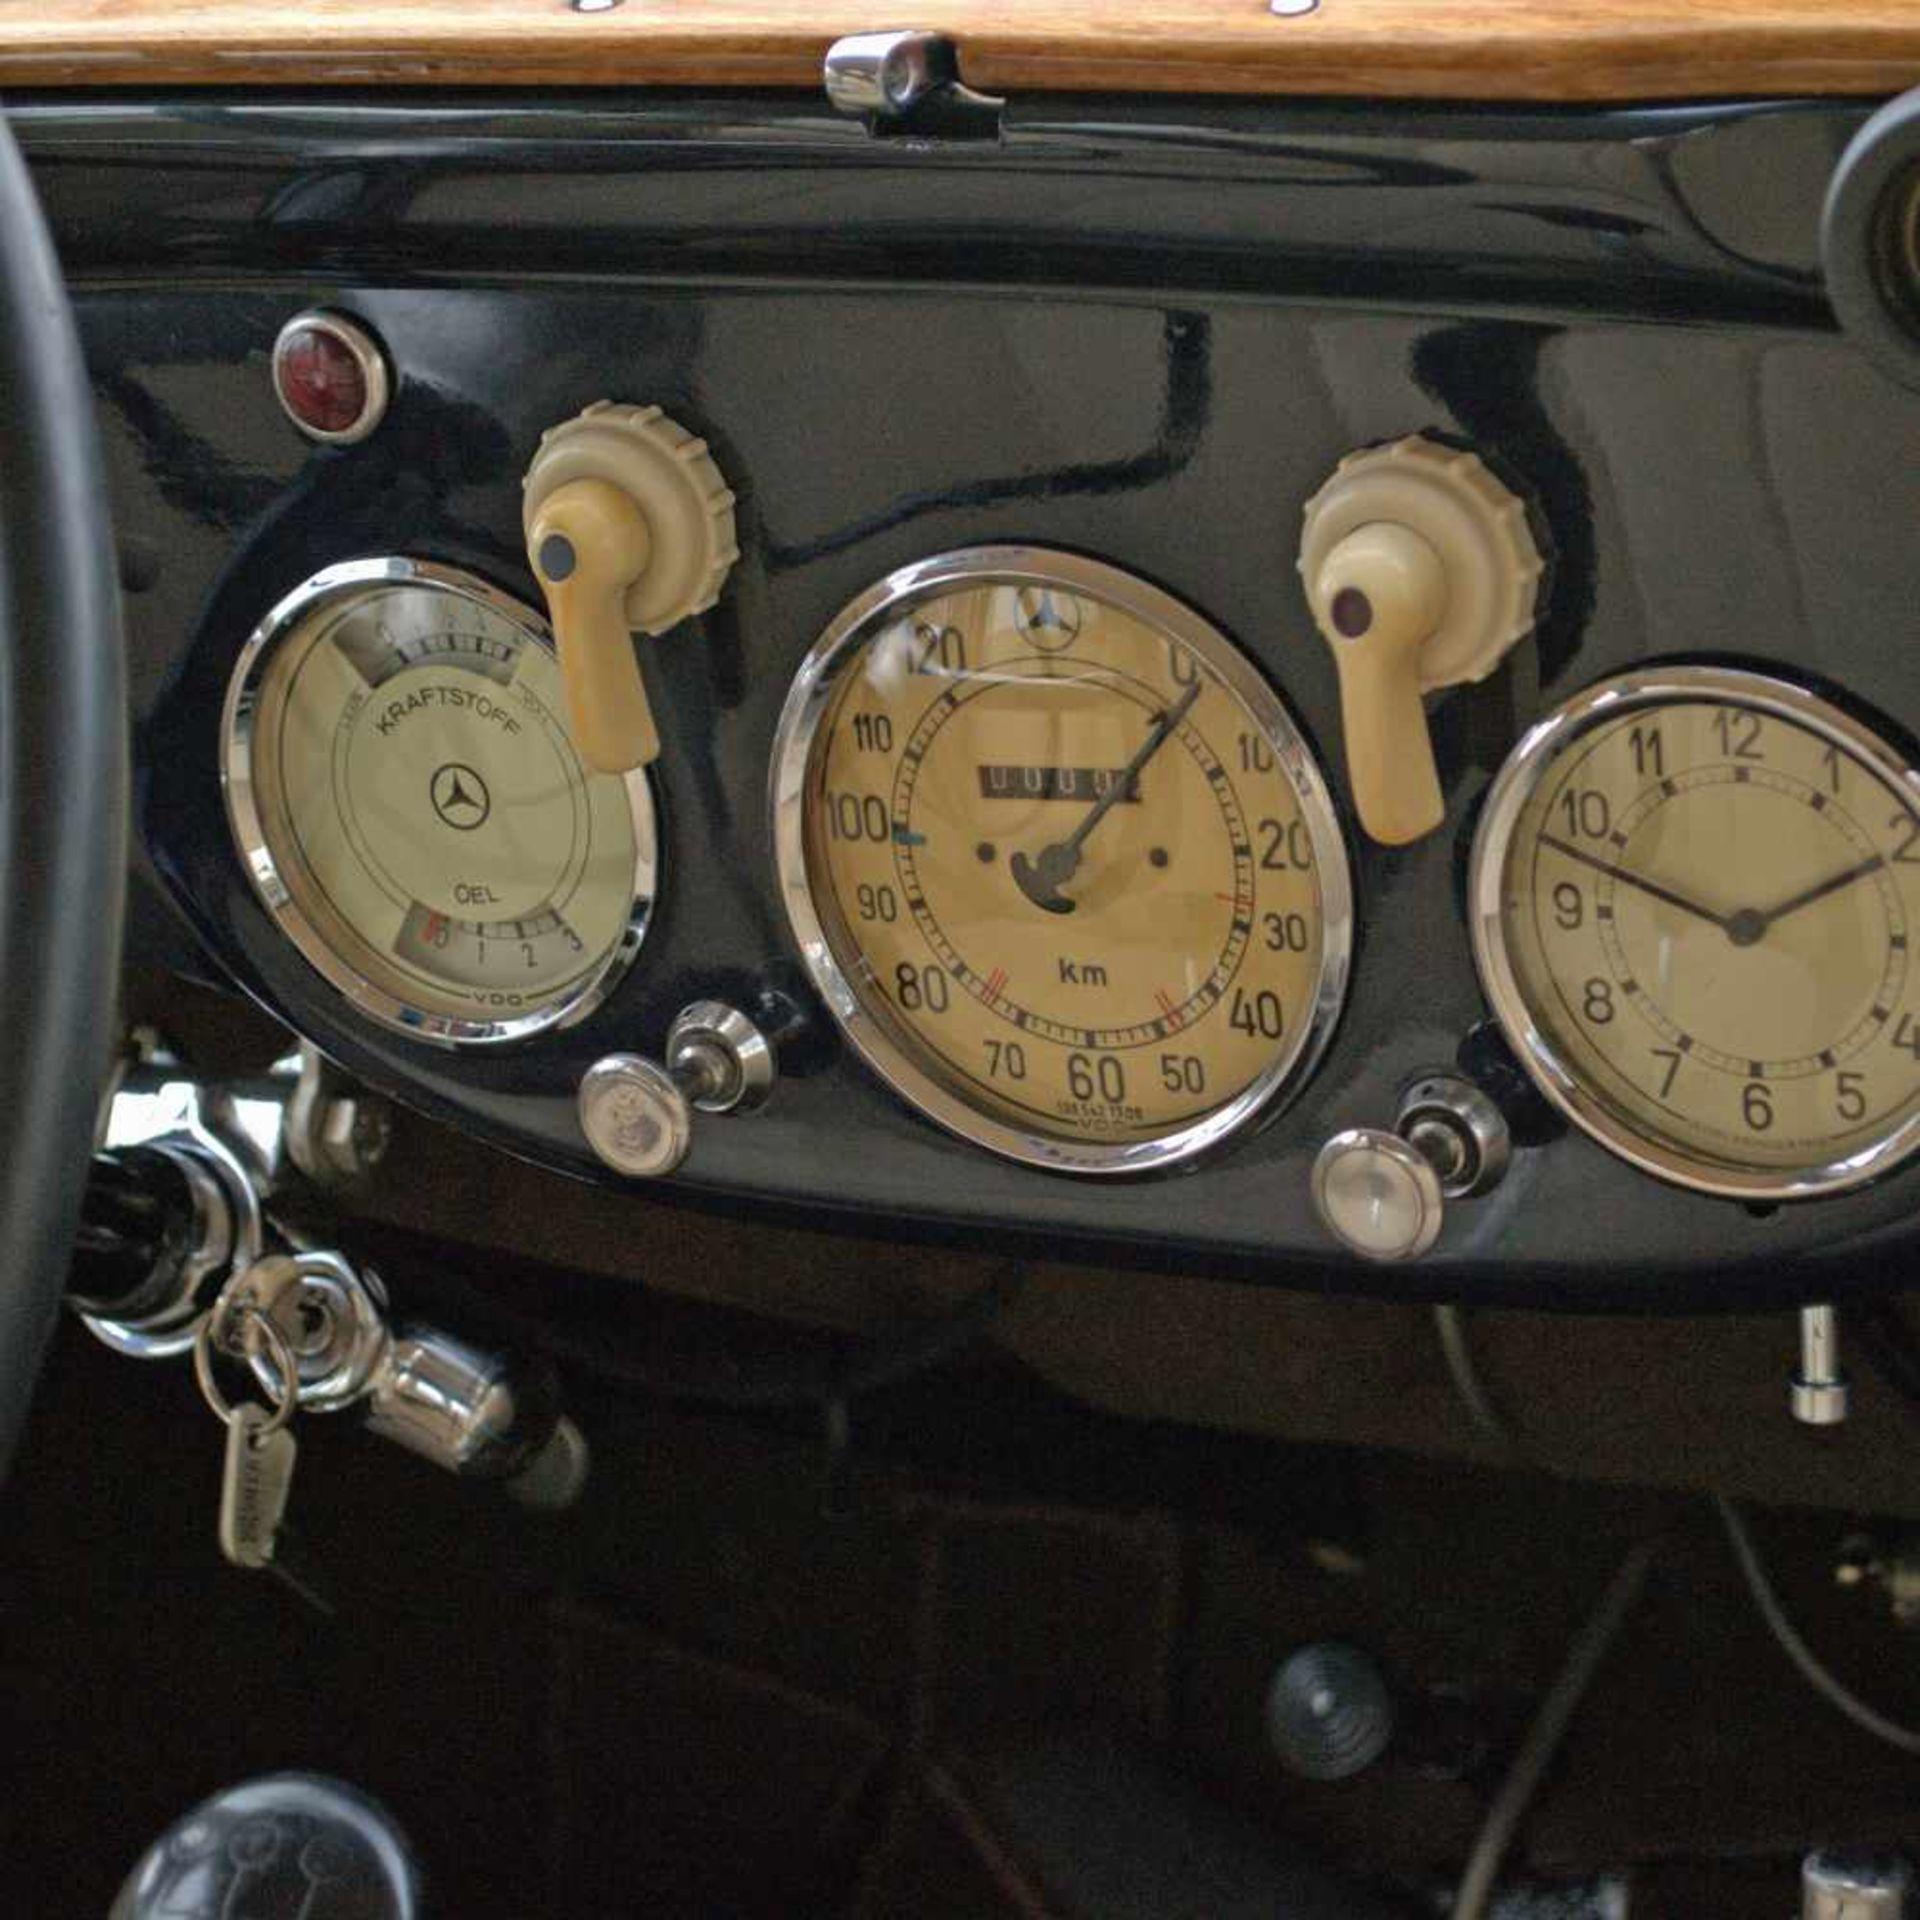 Mercedes 170 V, 1940, the most popular Mercedes-Benz model of the time - Bild 4 aus 4